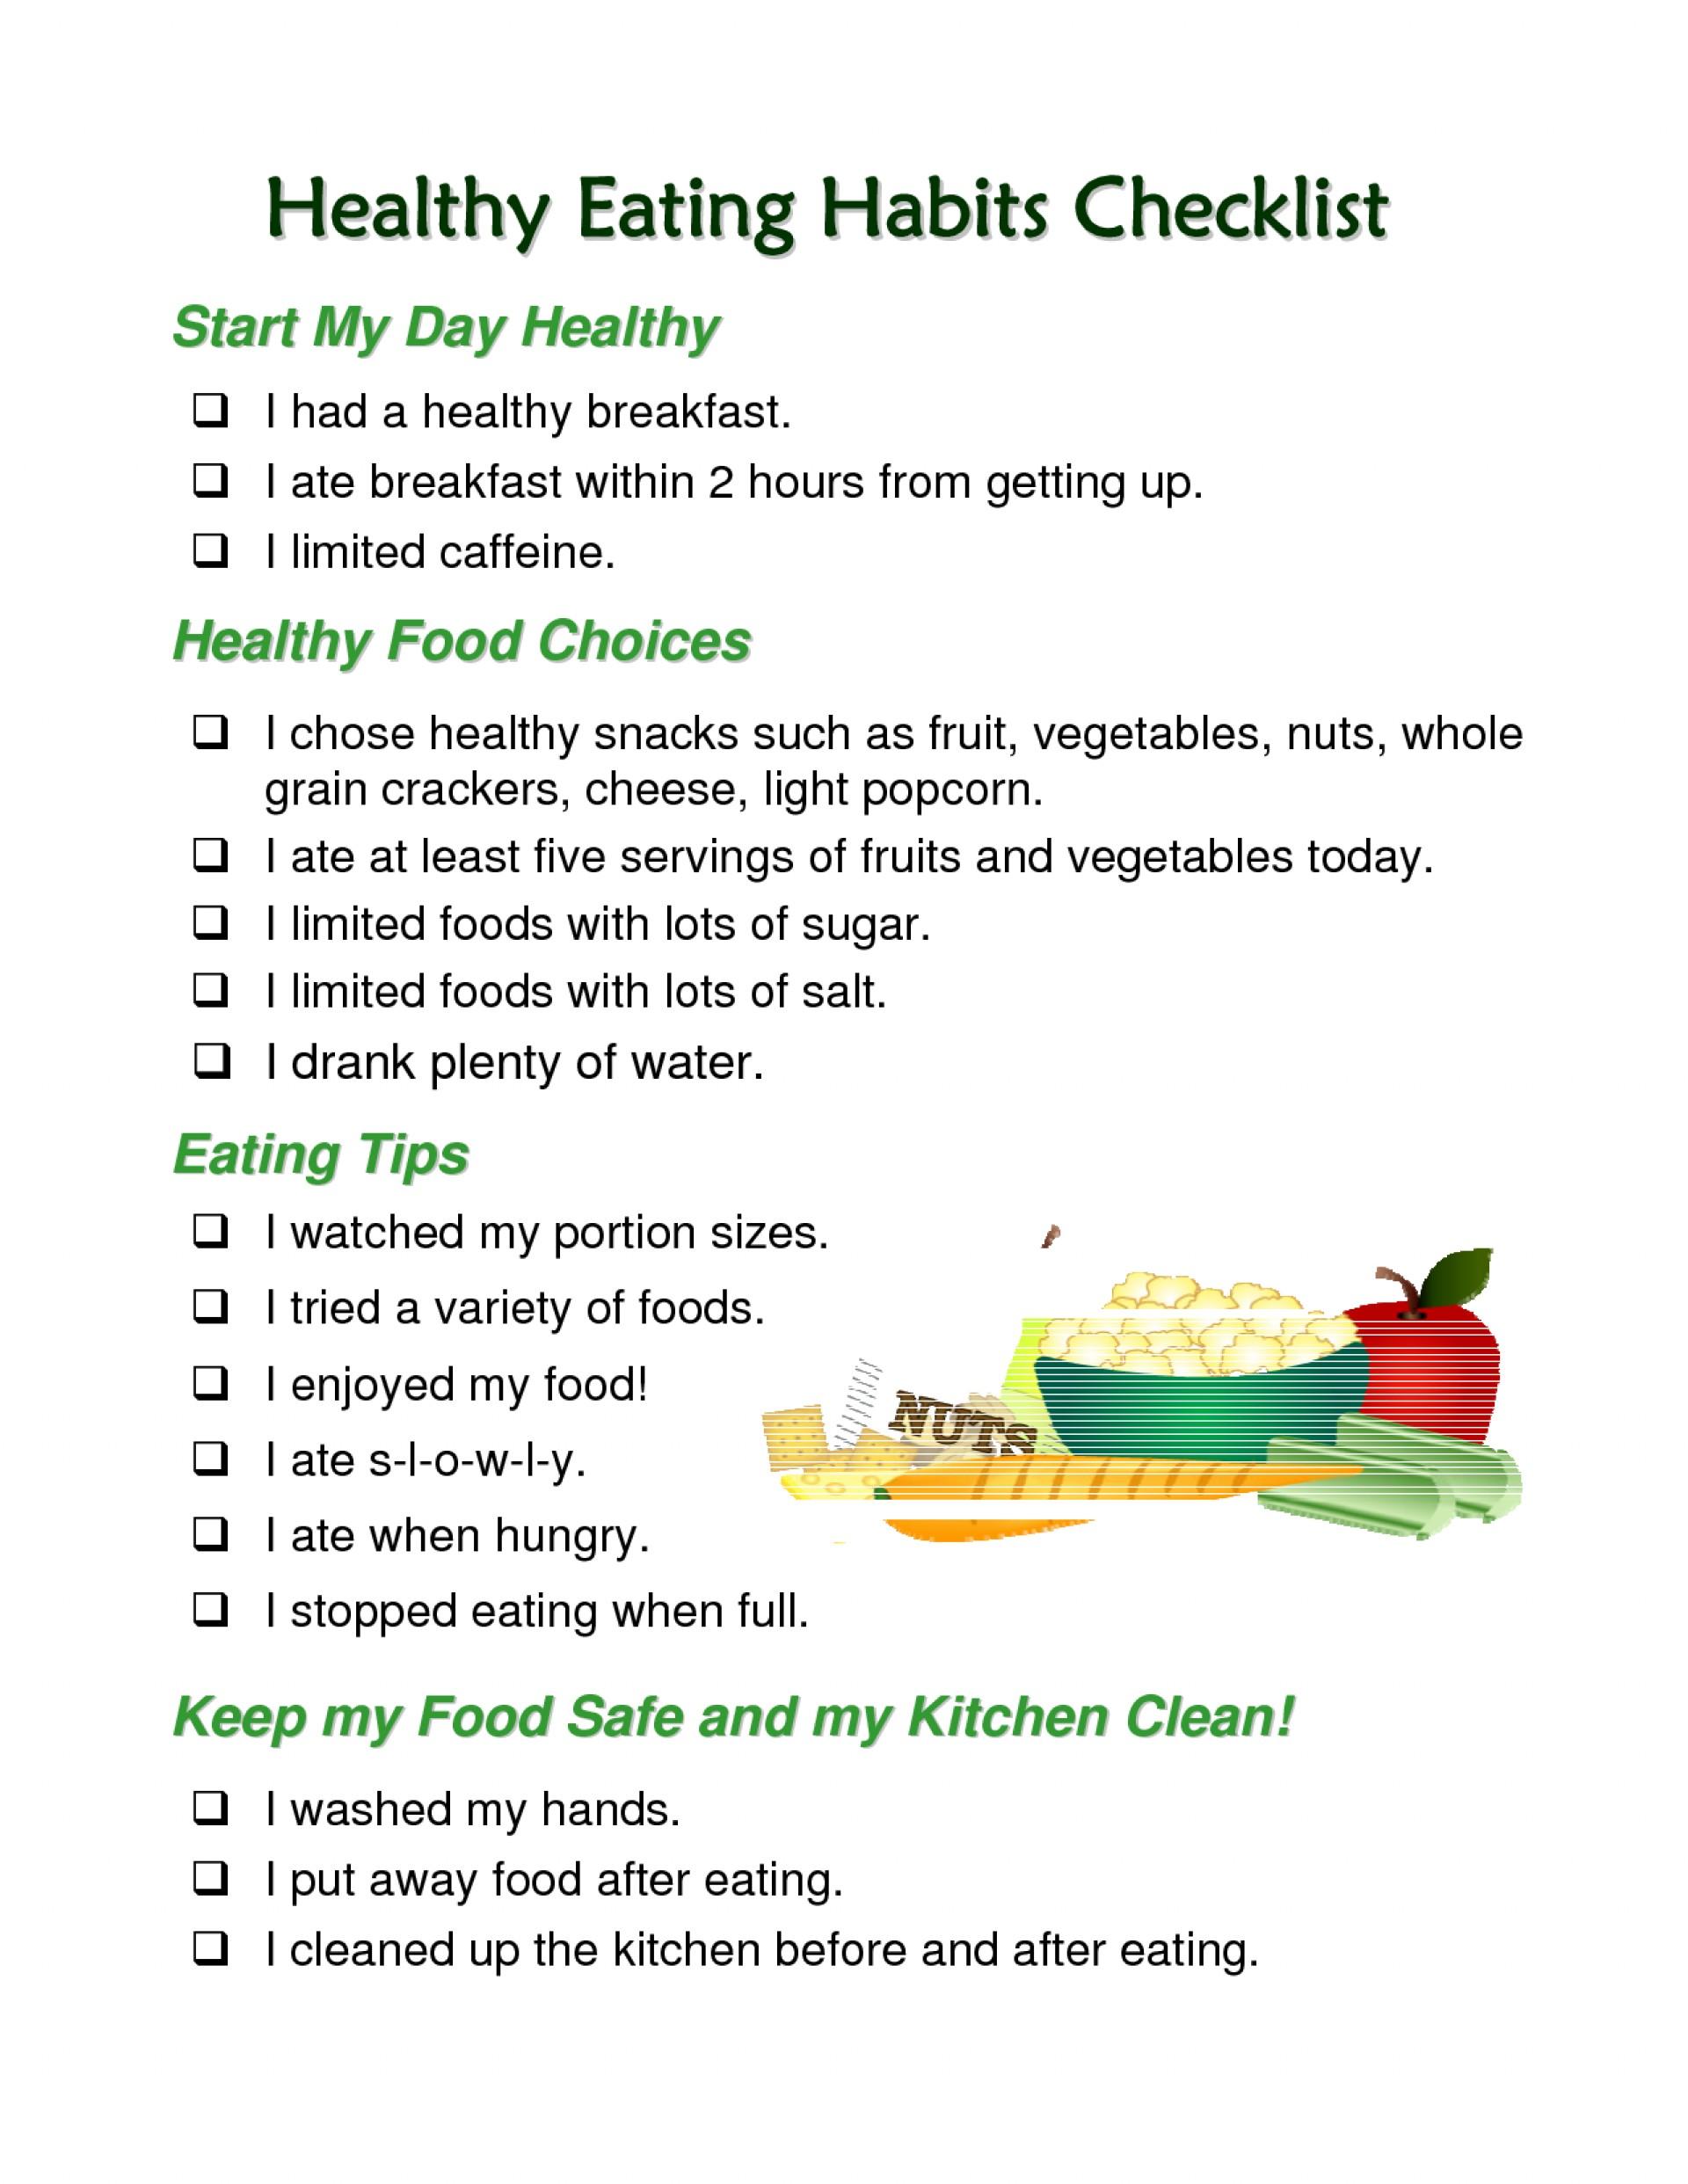 002 Essay Example Healthy Impressive Eating Topics Spm Habits Pdf 1920